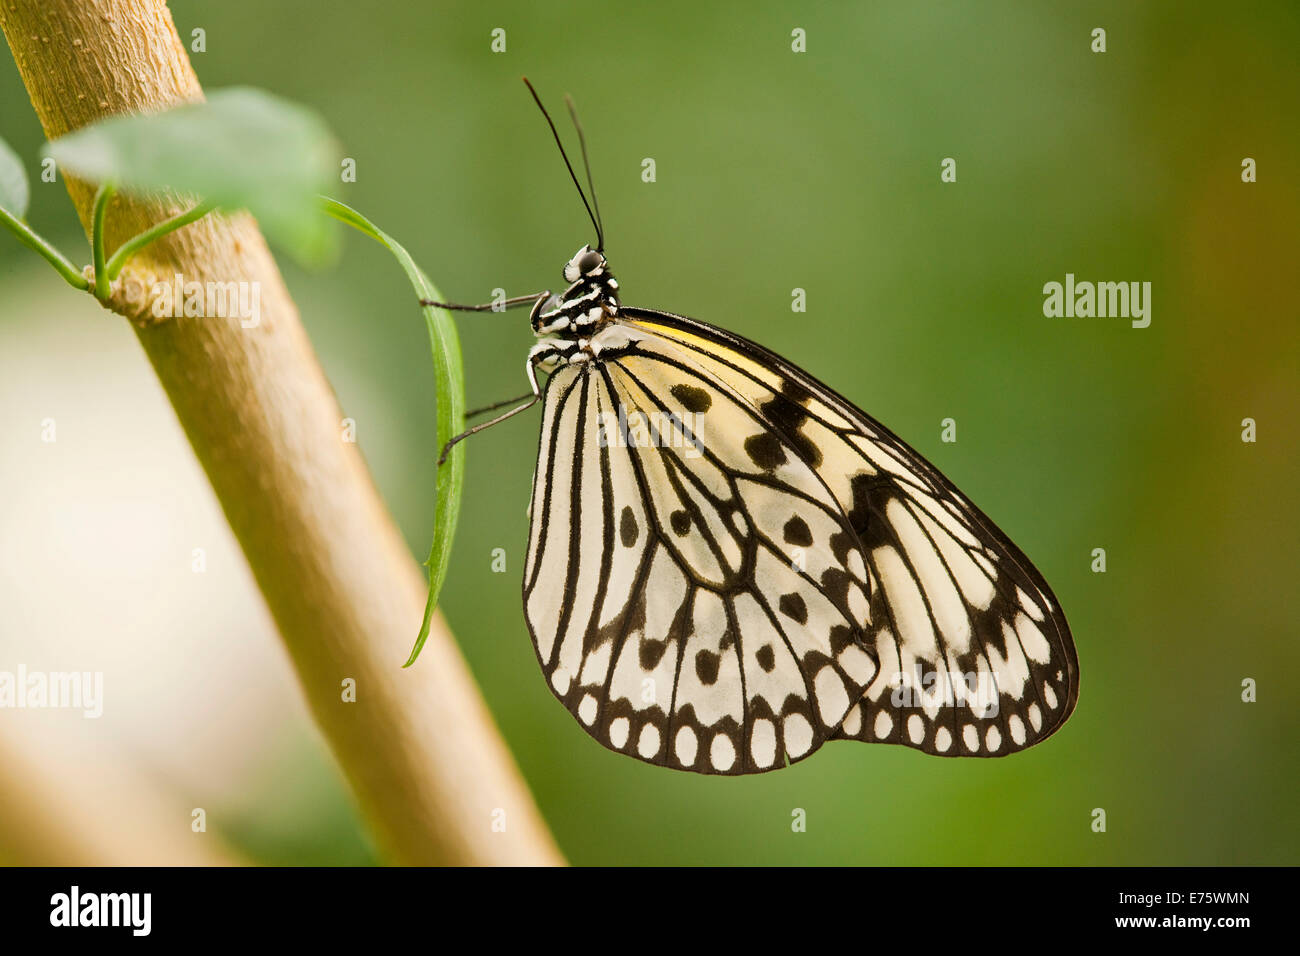 Paper Kite or Large Tree Nymph (Idea leuconoe), captive, Thuringia, Germany Stock Photo